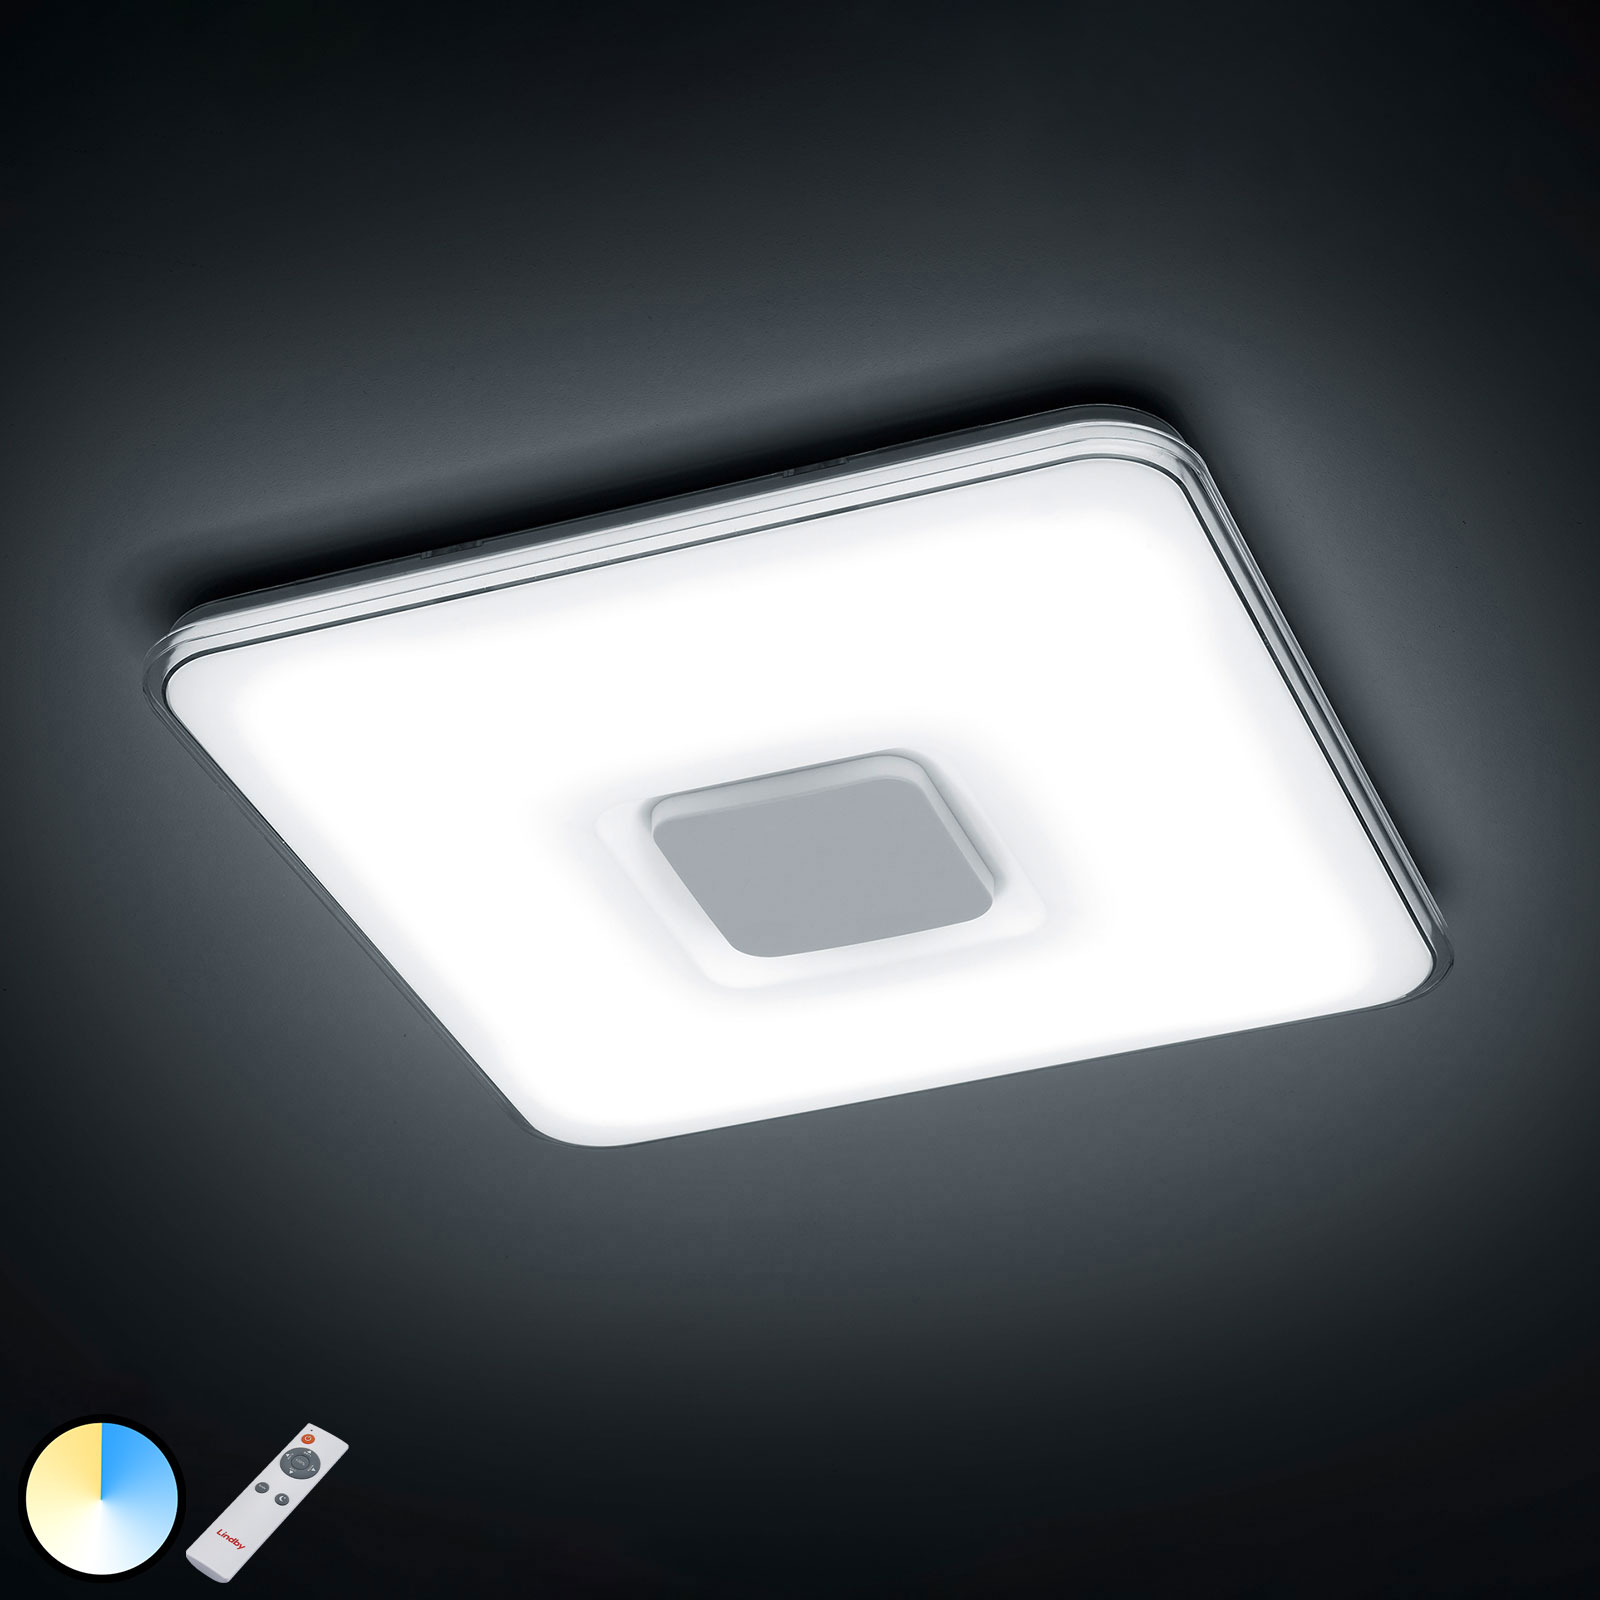 Lampa sufitowa LED Brajan, 3000-5500 K,kanciasta